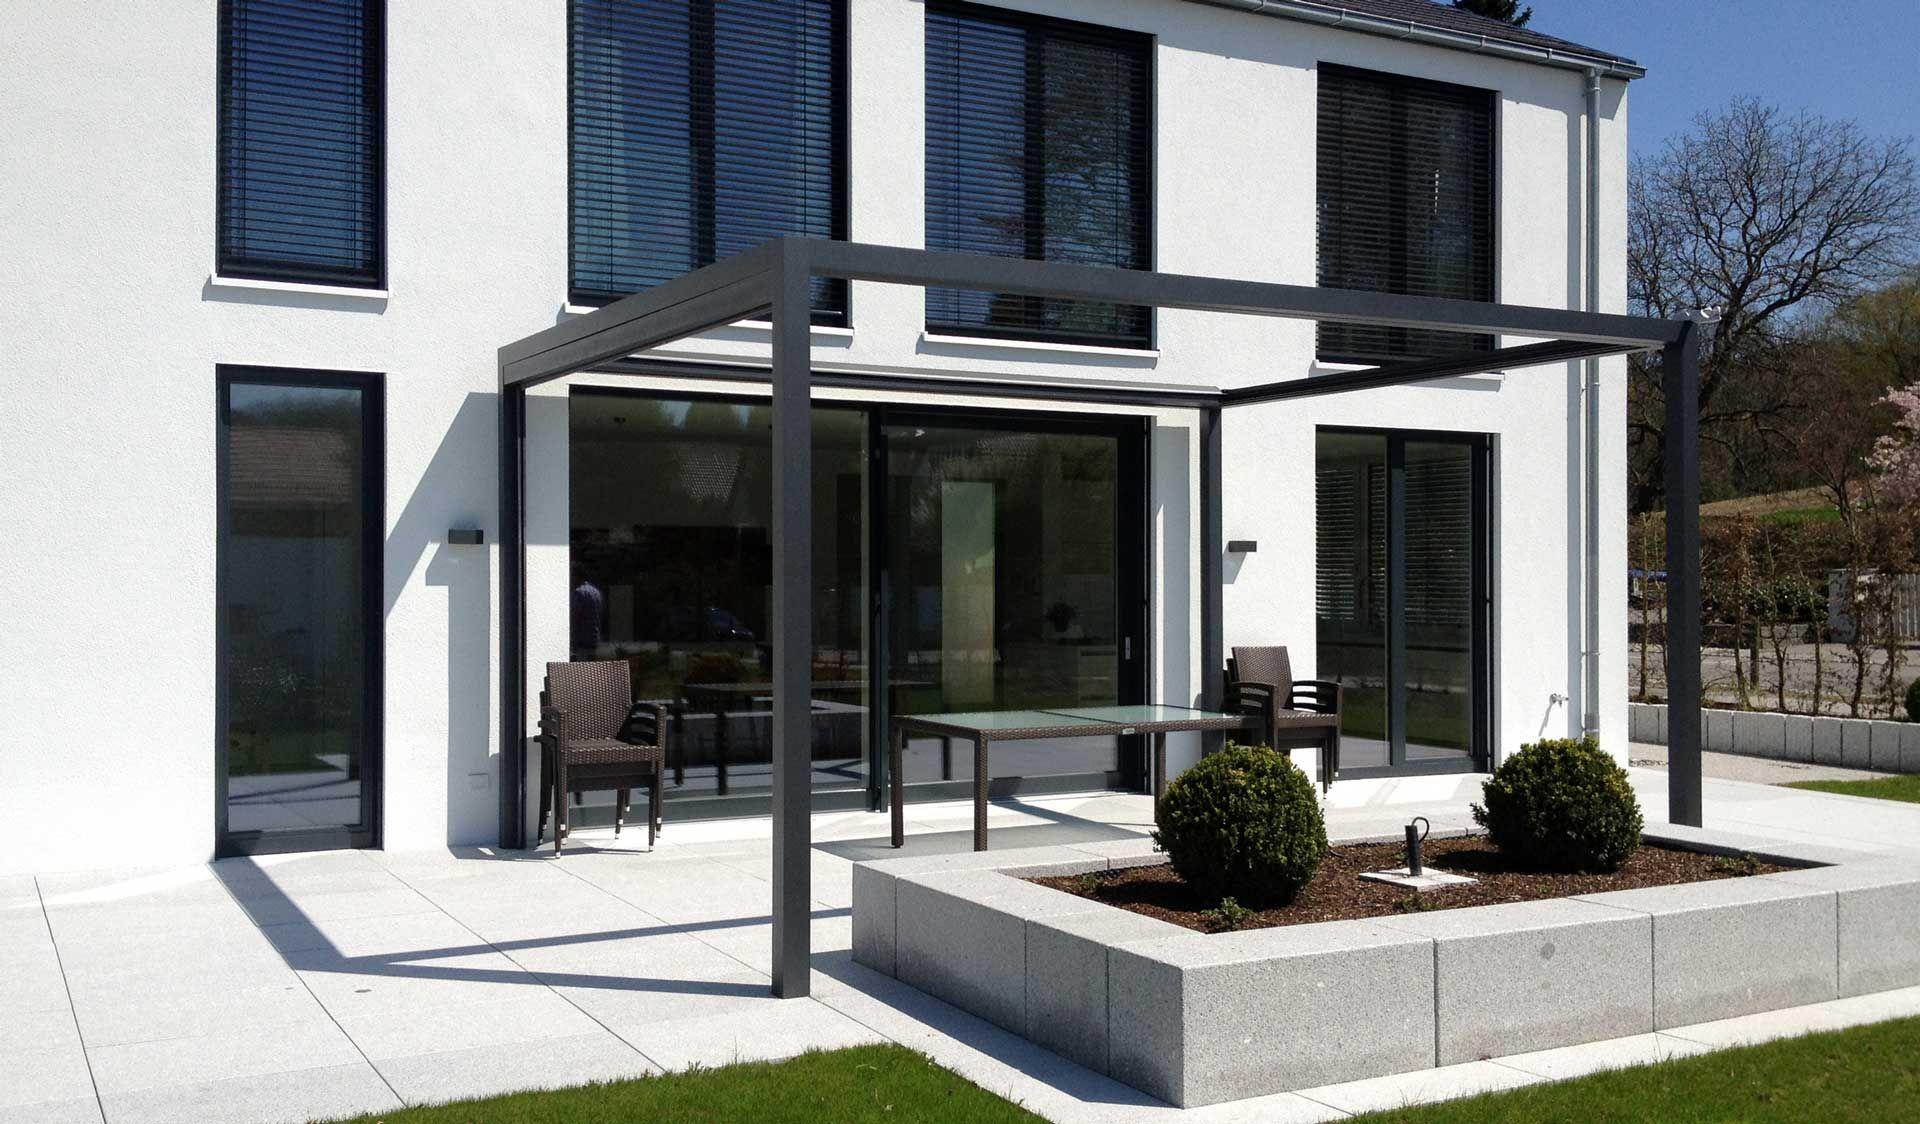 sonnen sichtschutz markisen sonnensegel kupkagarten in waiblingen design pinterest. Black Bedroom Furniture Sets. Home Design Ideas